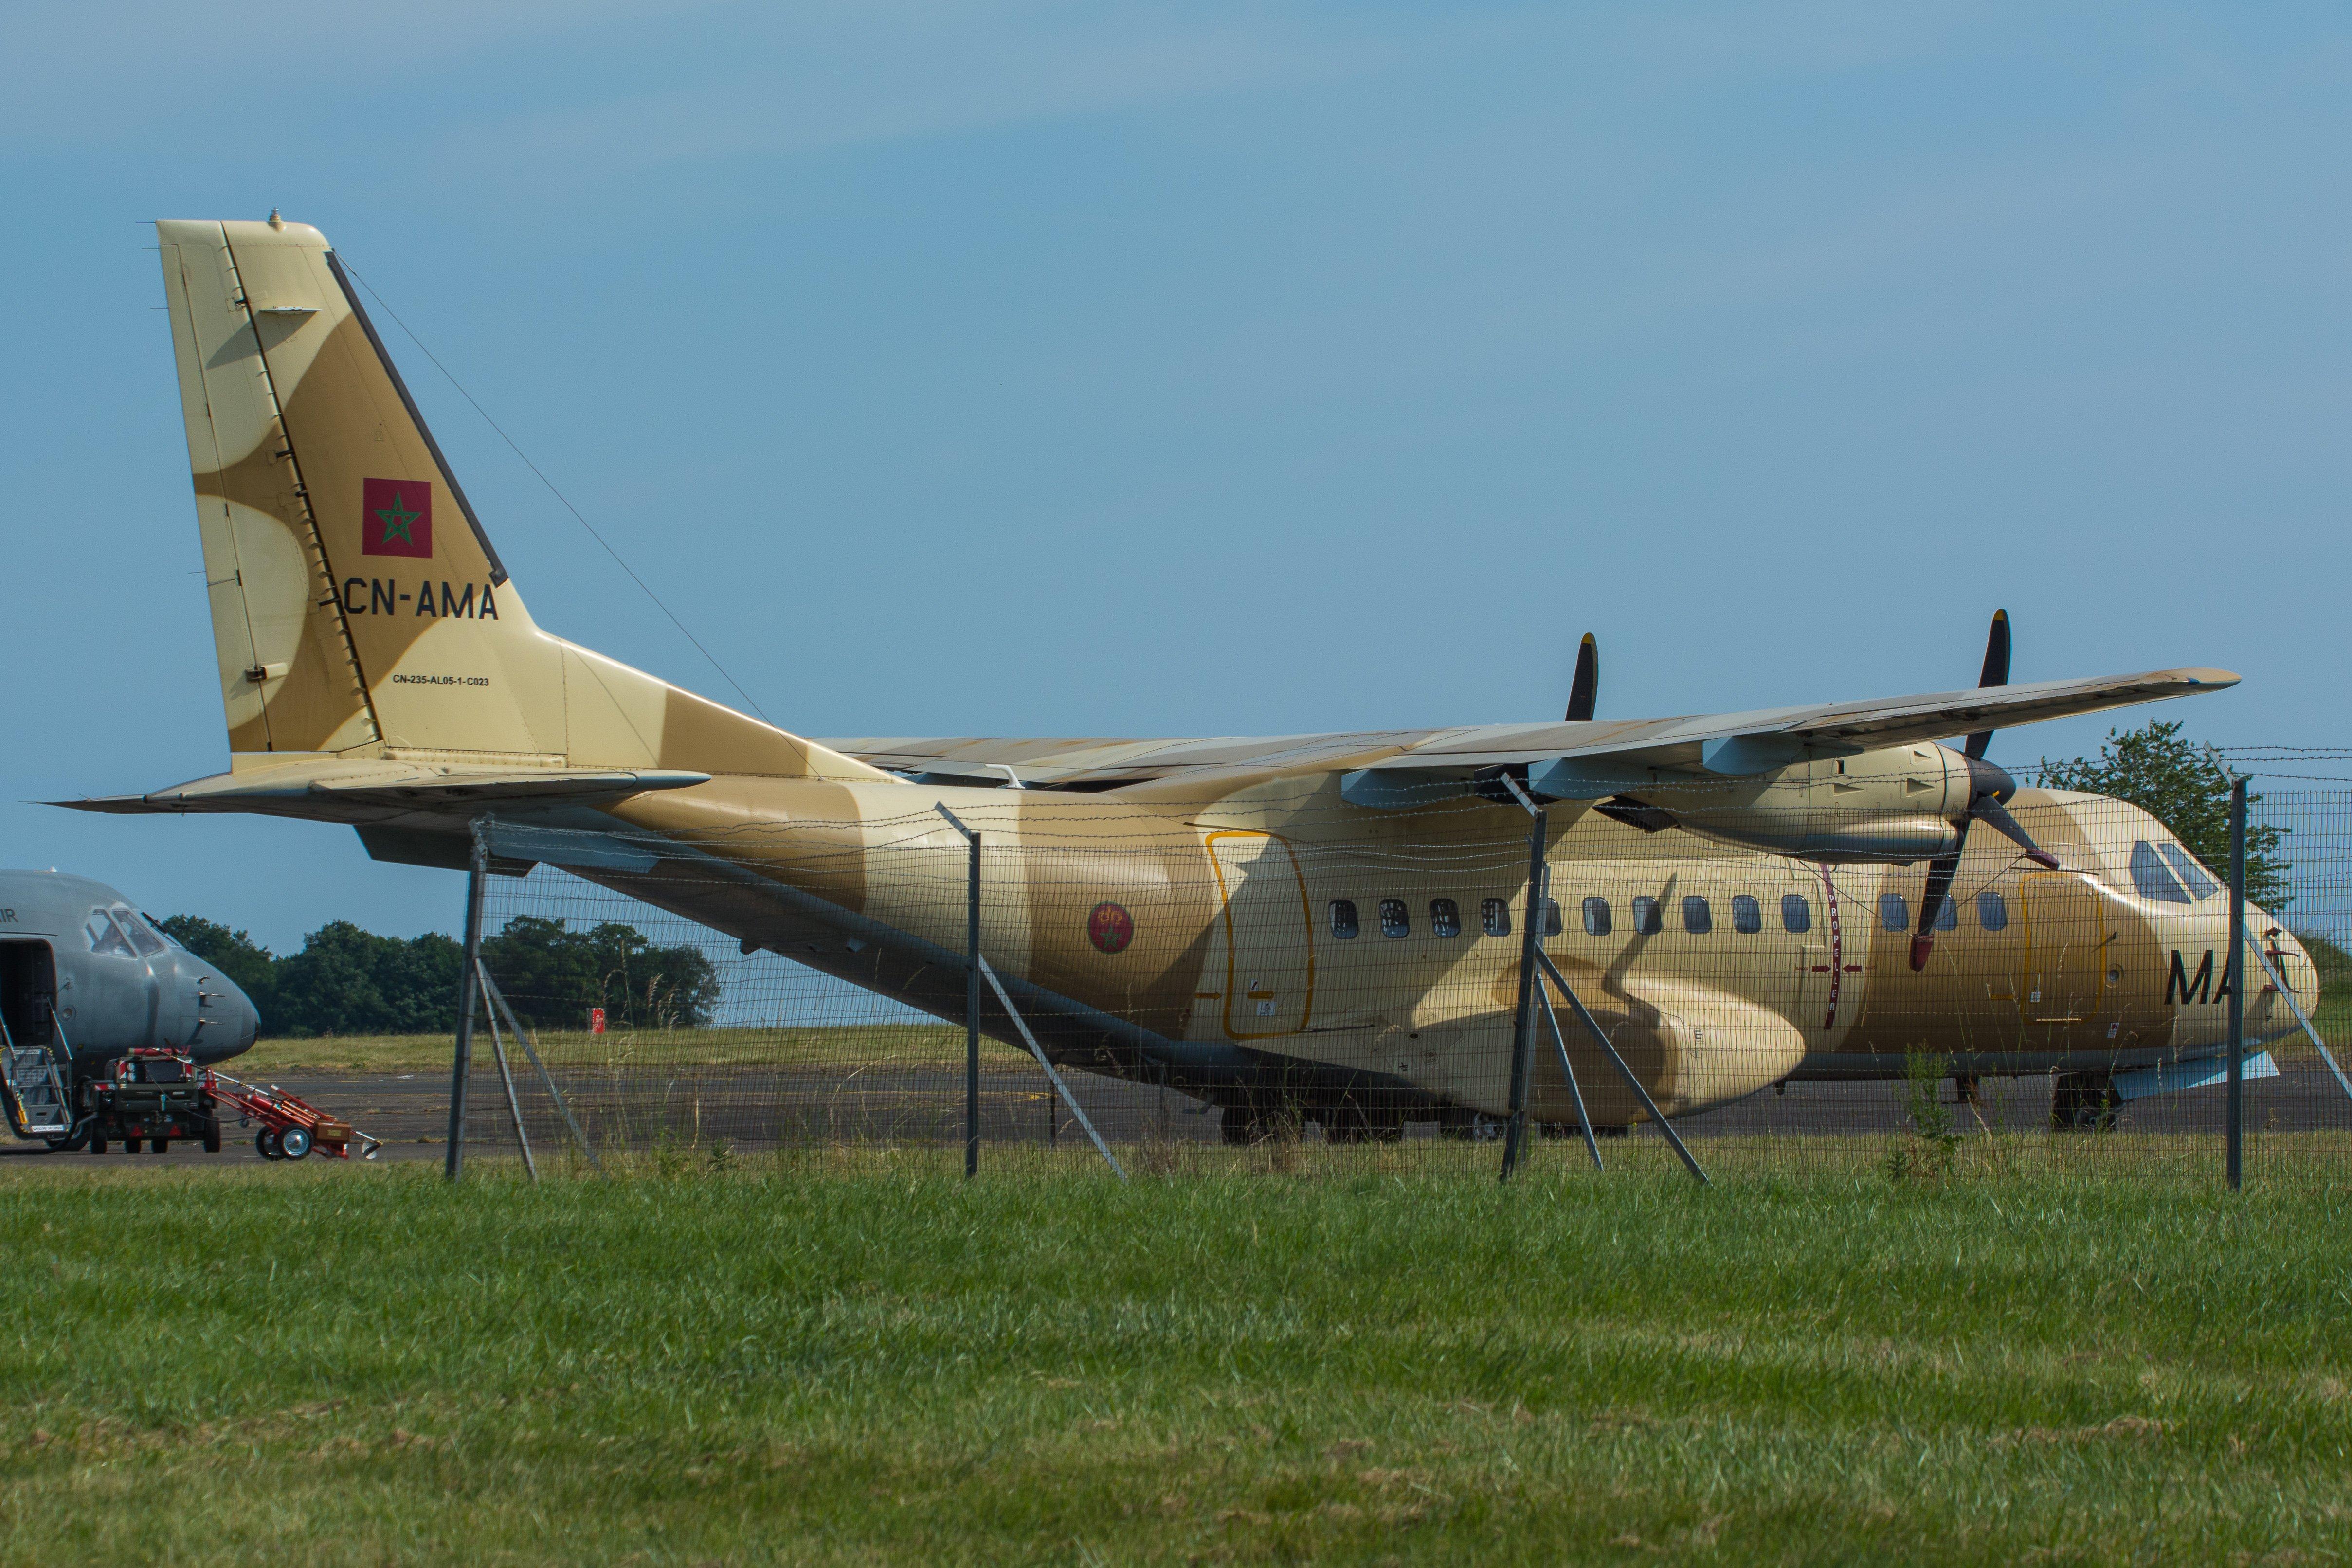 FRA: Photos d'avions de transport - Page 22 18401332813_d80dc659b1_o